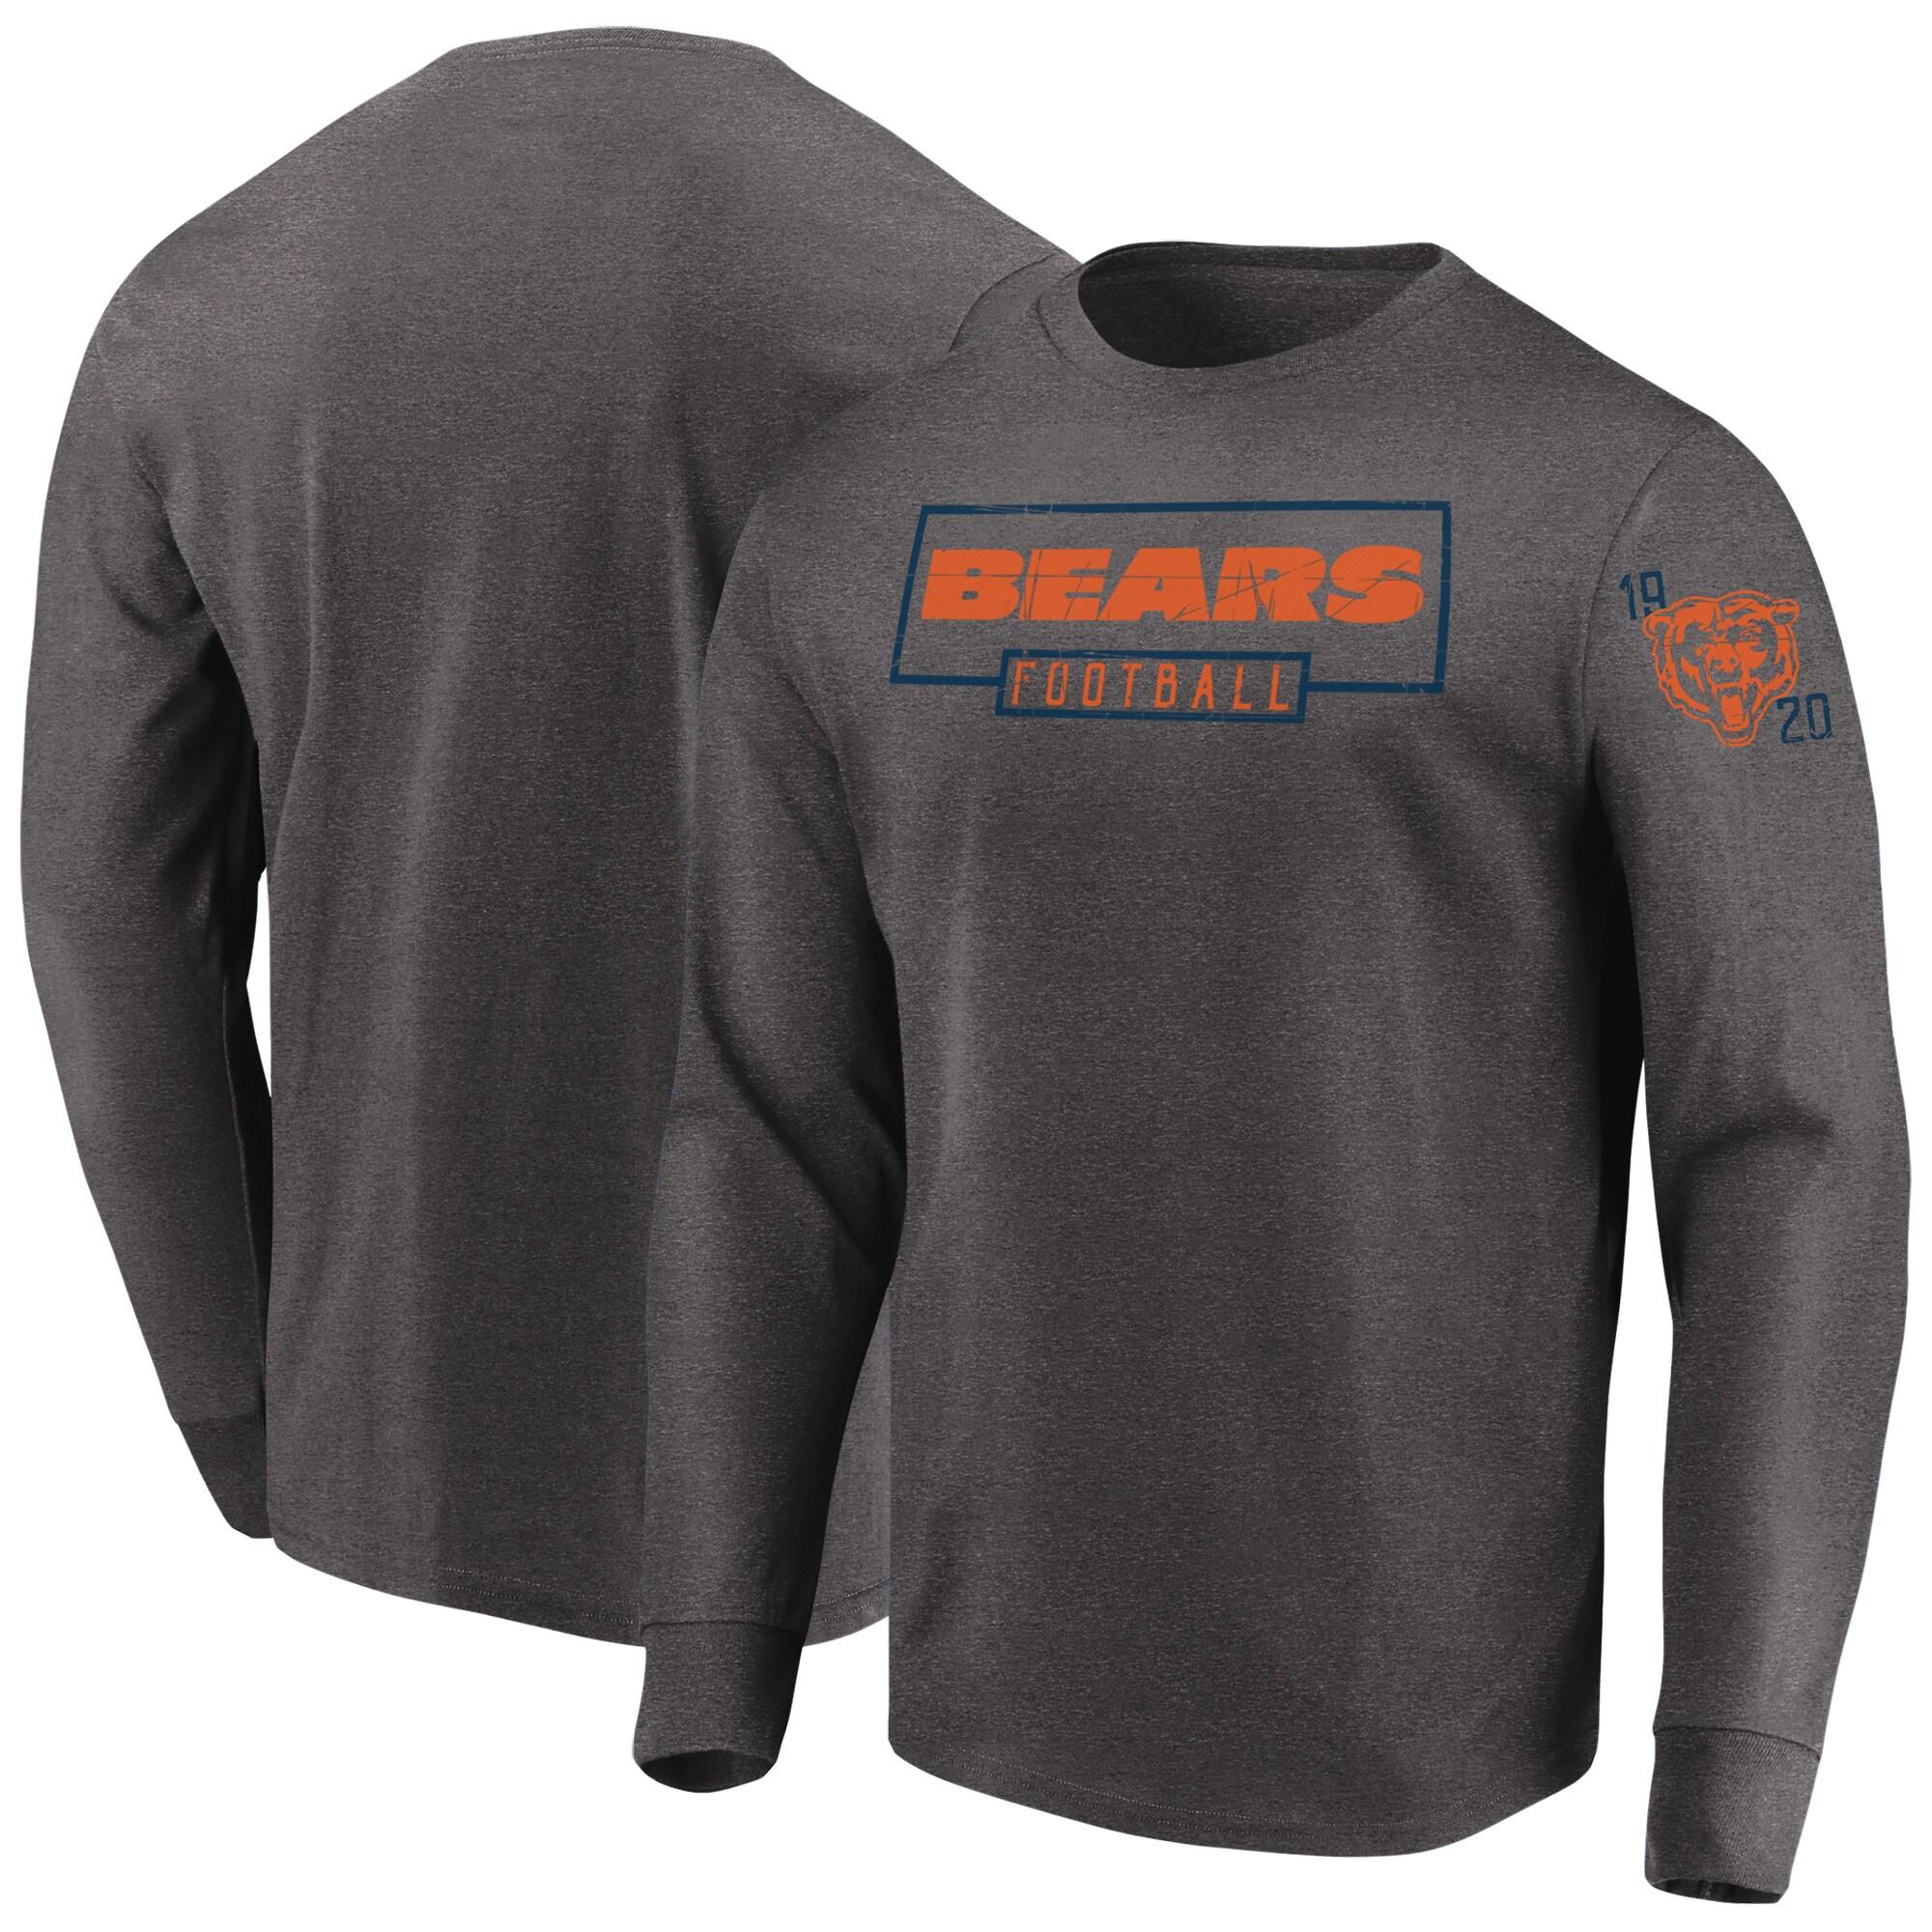 Chicago Bears Majestic Kick Return Long Sleeve T-Shirt - Heathered Charcoal